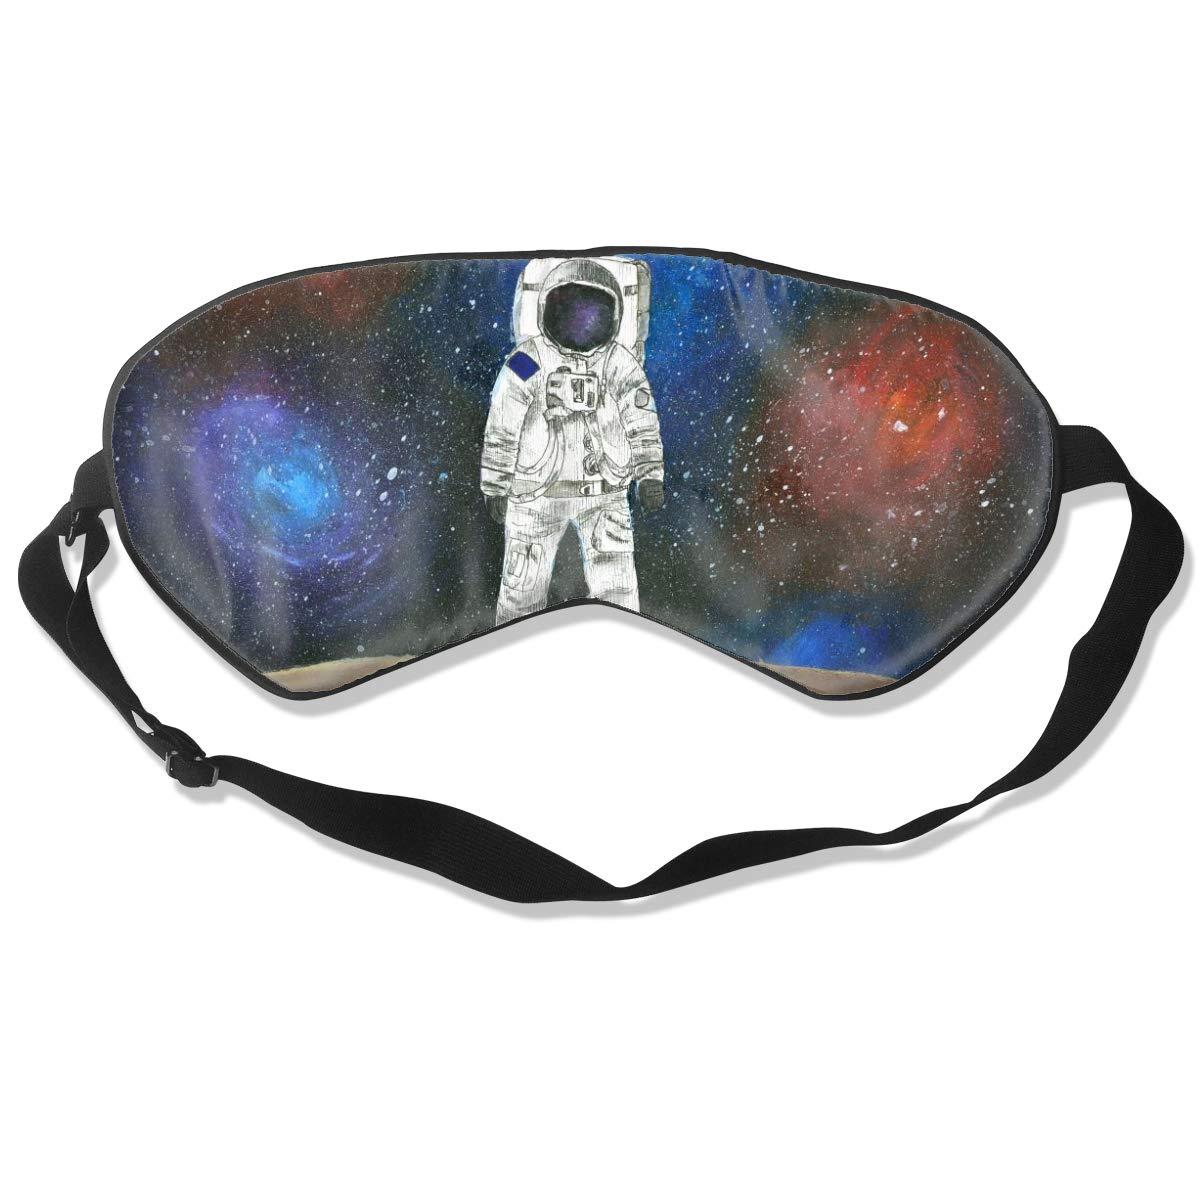 Darkt Space Astronaut Sleep Mask Funny Lightweight Blindfold Cover Eyeshade for Women Men Kid with Adjustable Strap Plane Travel Naps Shift Works Games